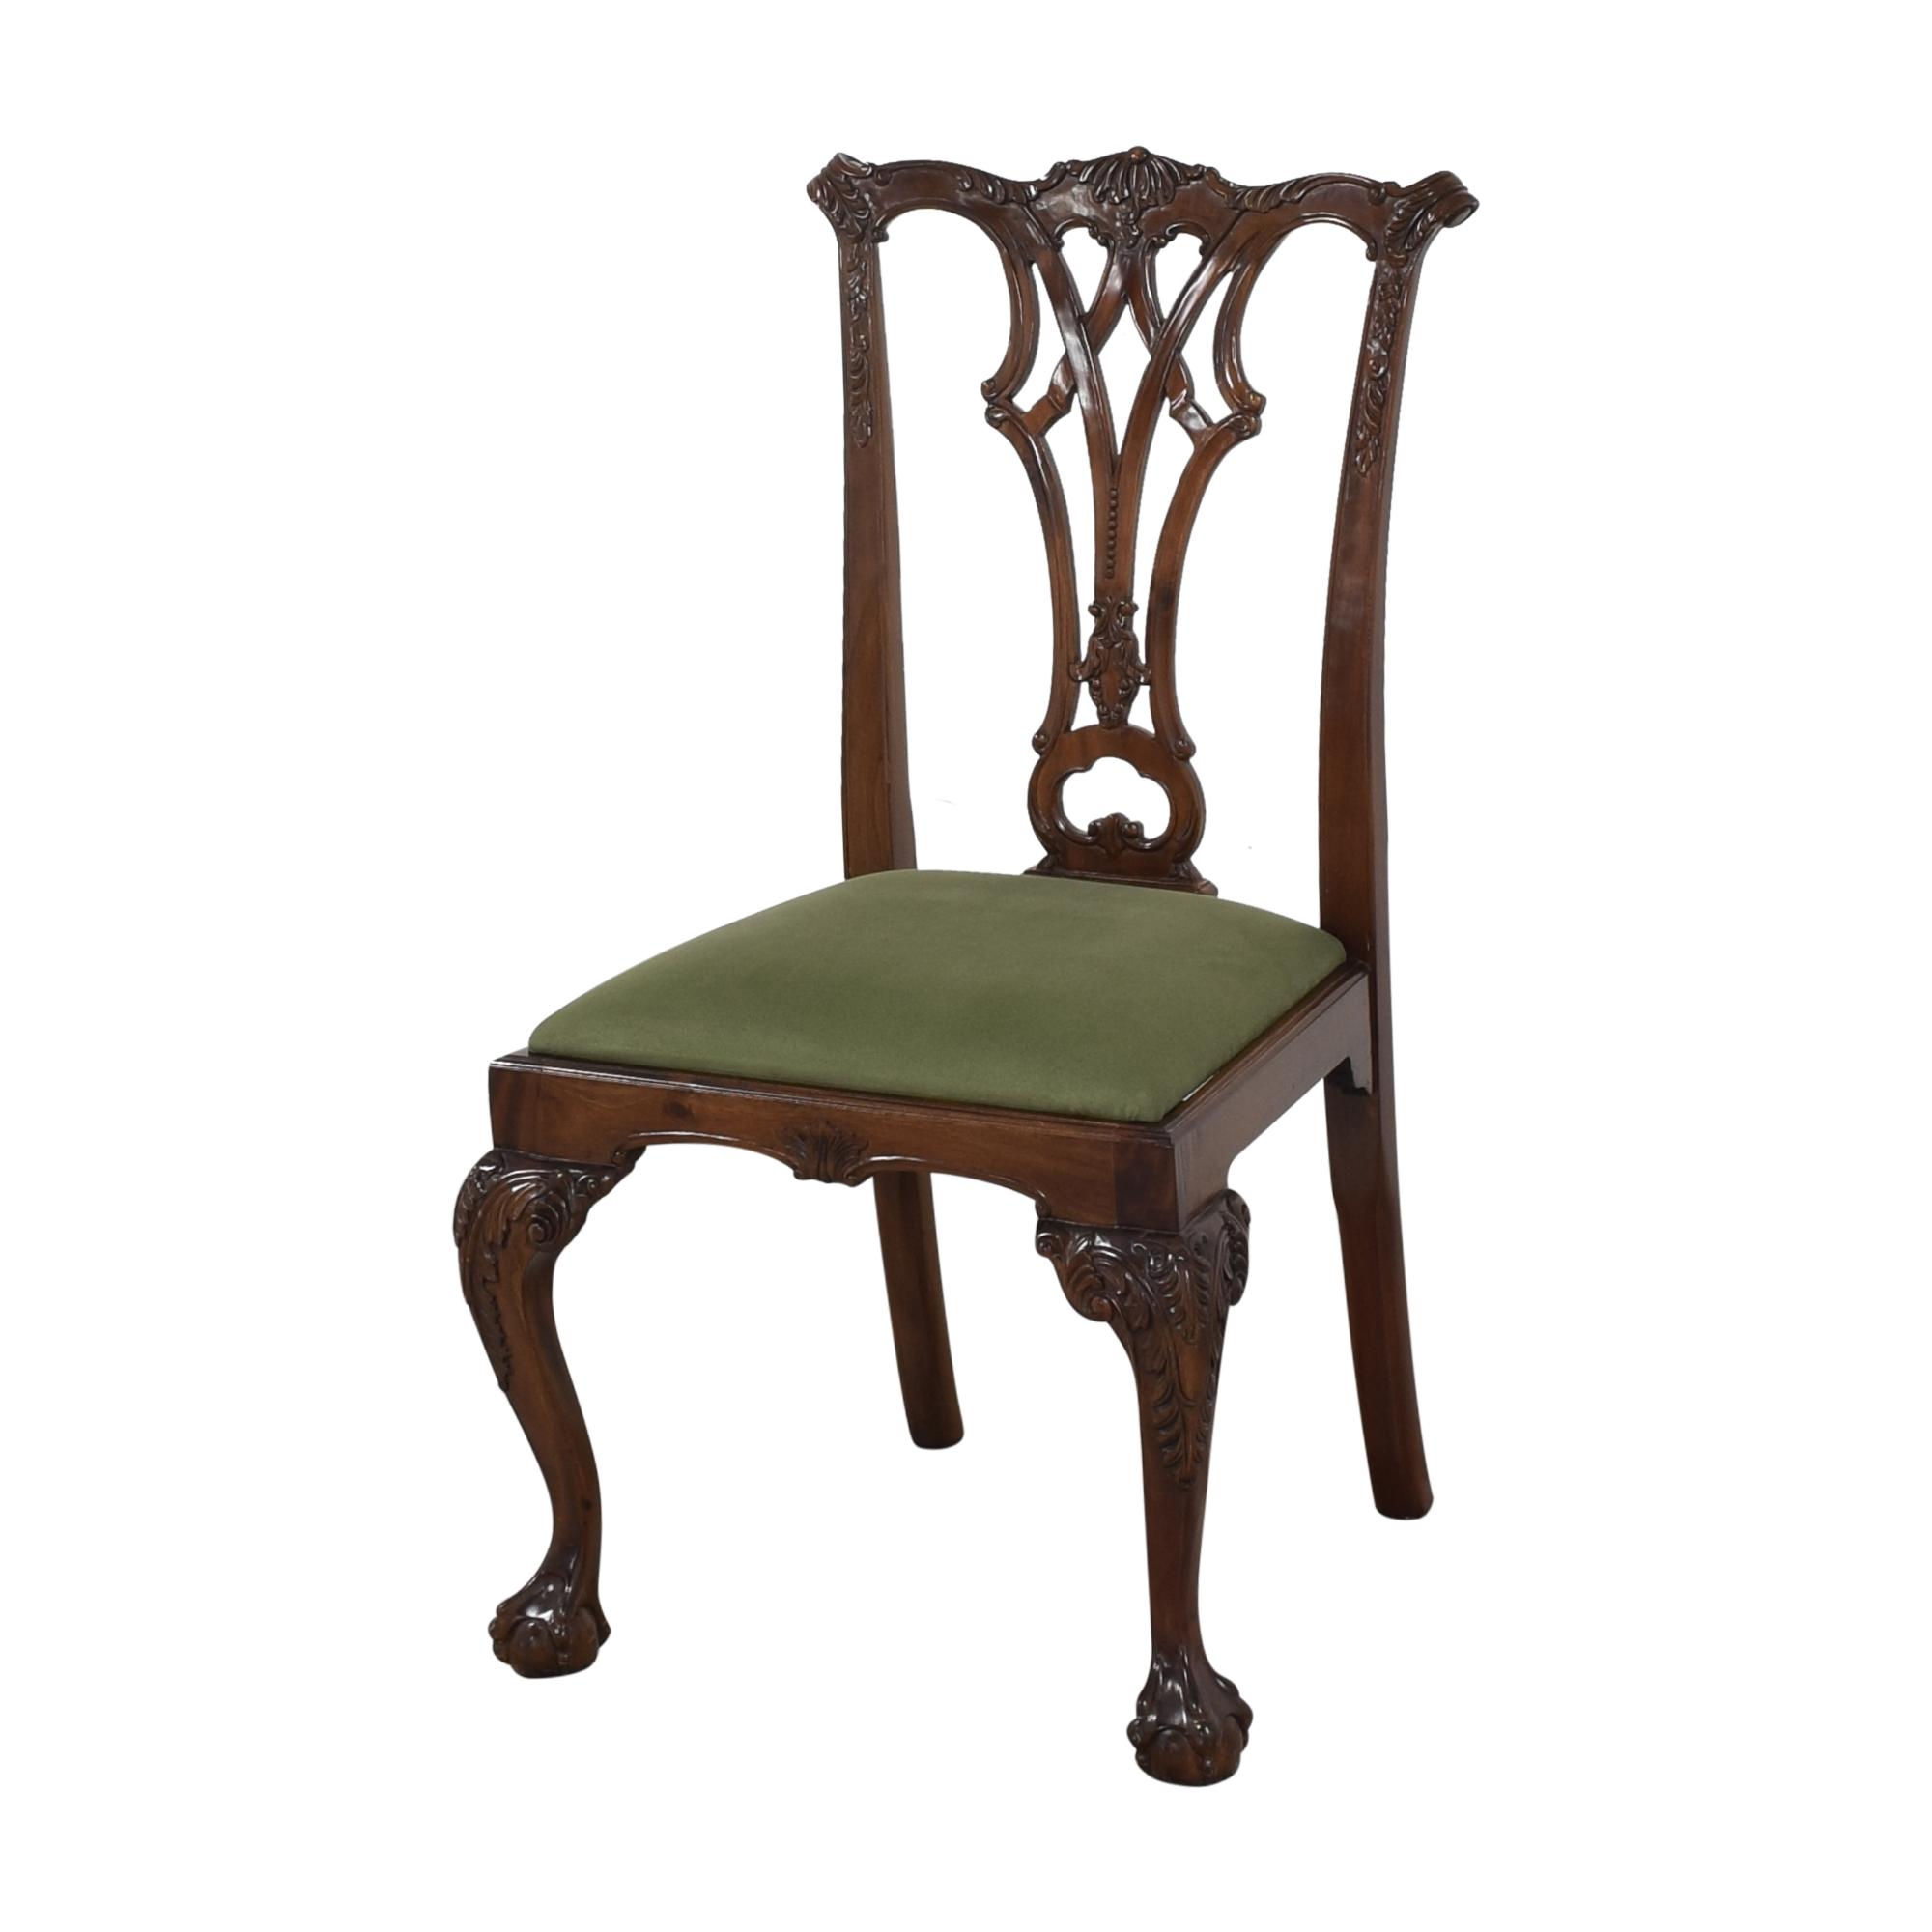 Greenbaum Interiors Greenbaum Interiors Vintage Upholstered Dining Chairs ct